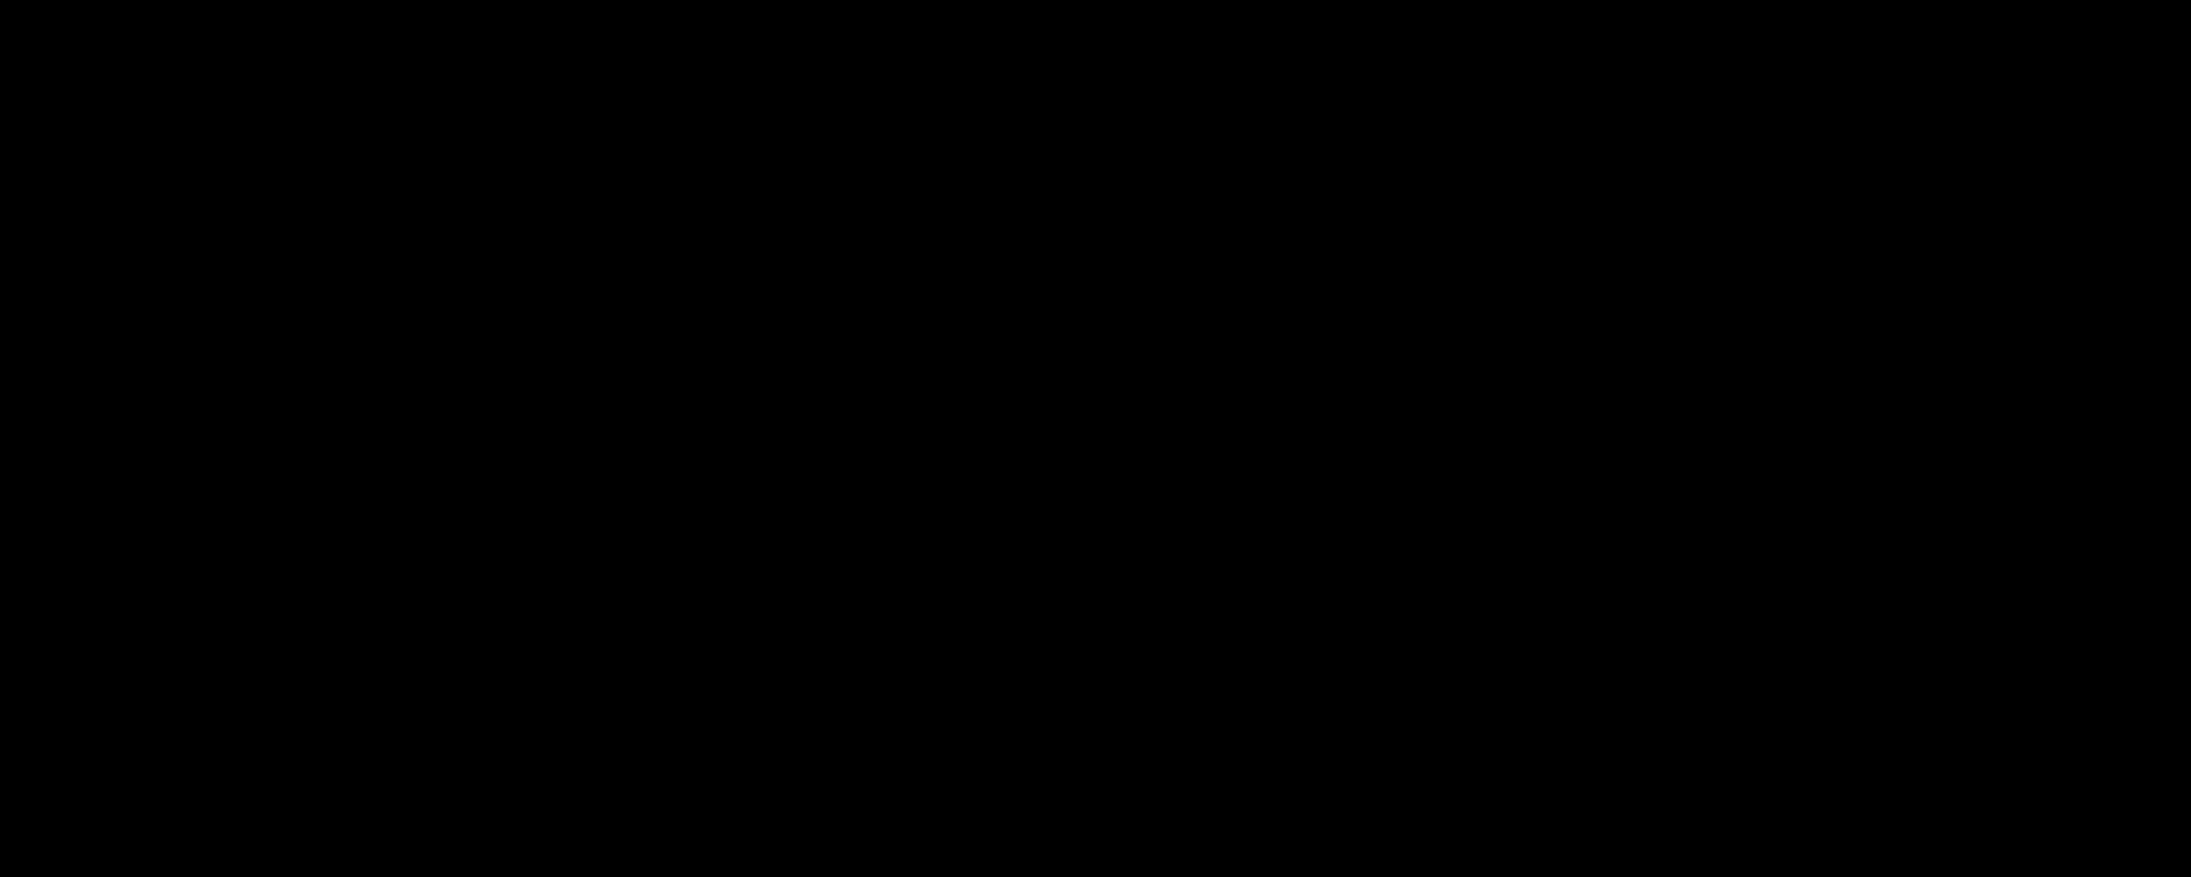 Download Ktm Racing Logo Png